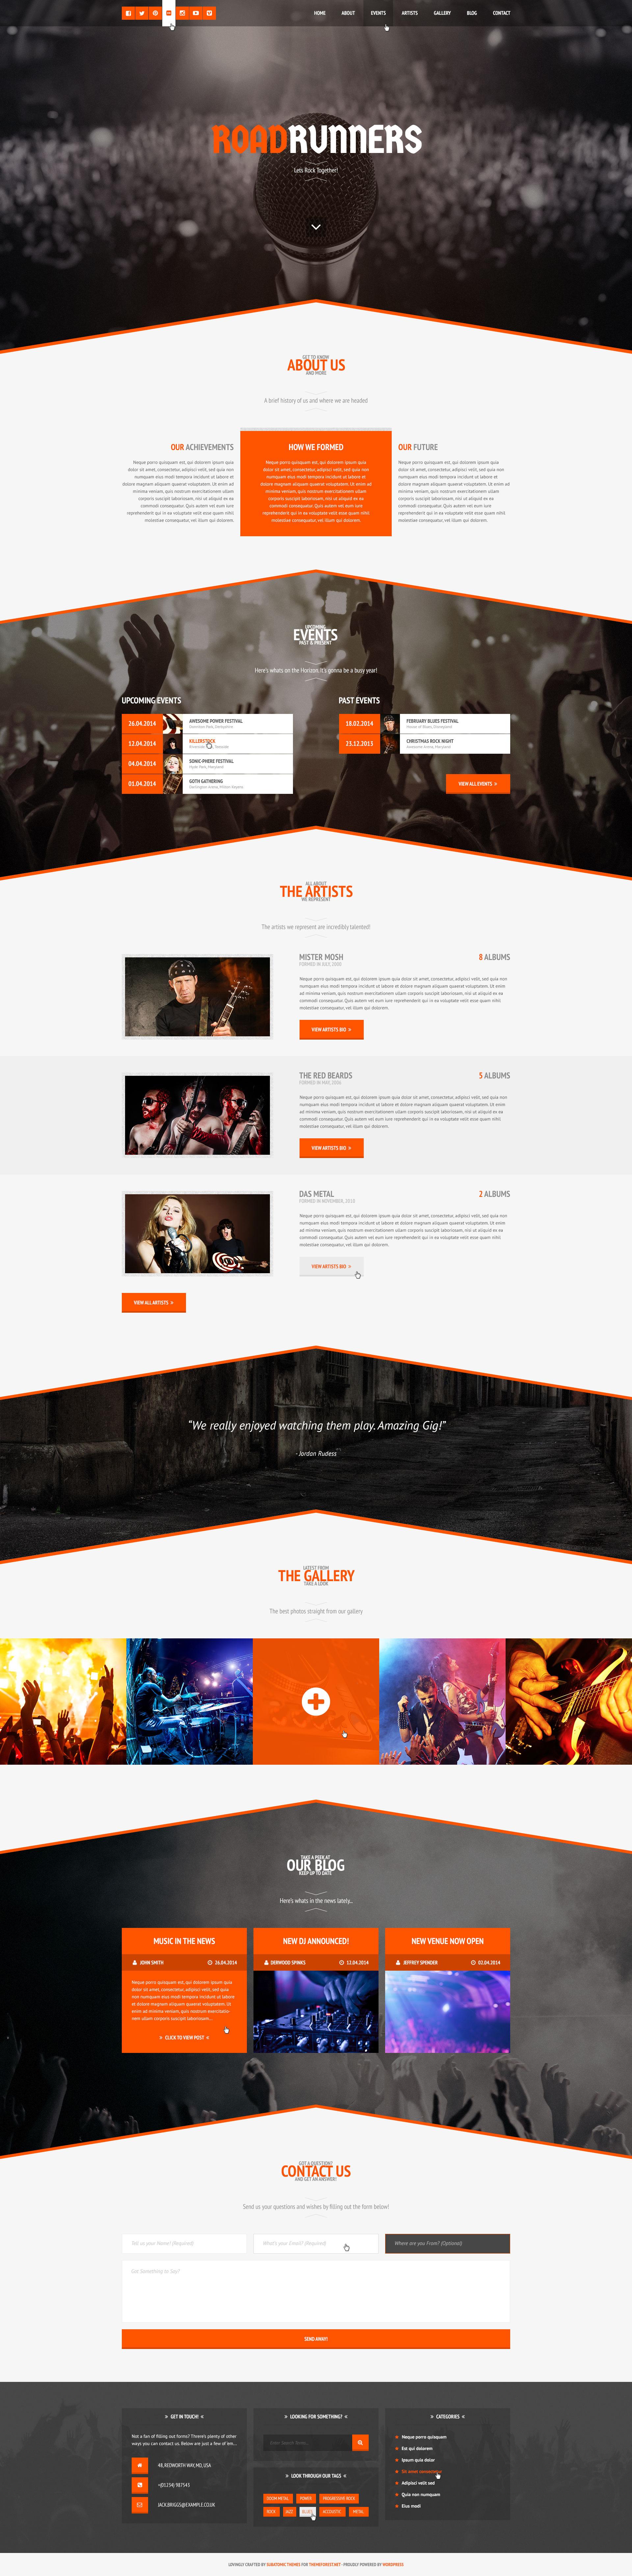 RoadRunners - A One-Page Music WordPress Theme by SubatomicThemes ...